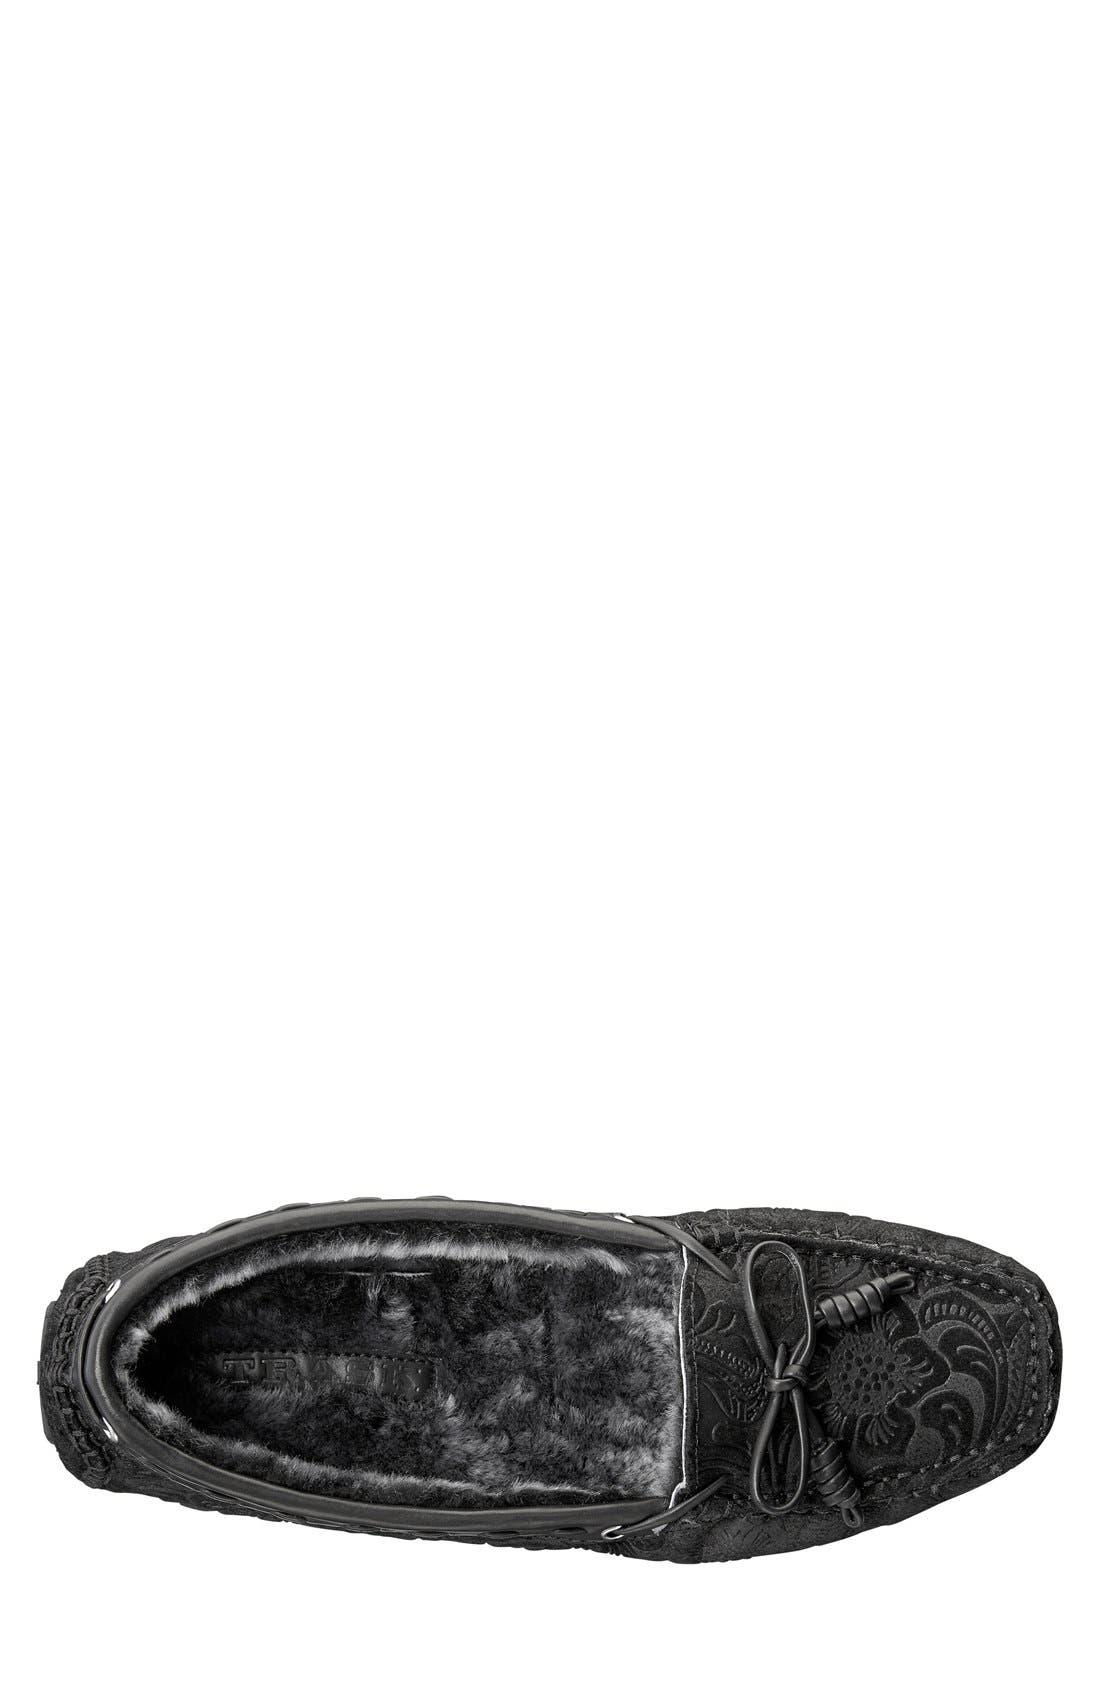 'Sophia' Genuine Shearling Lined Driving Loafer,                             Alternate thumbnail 4, color,                             008